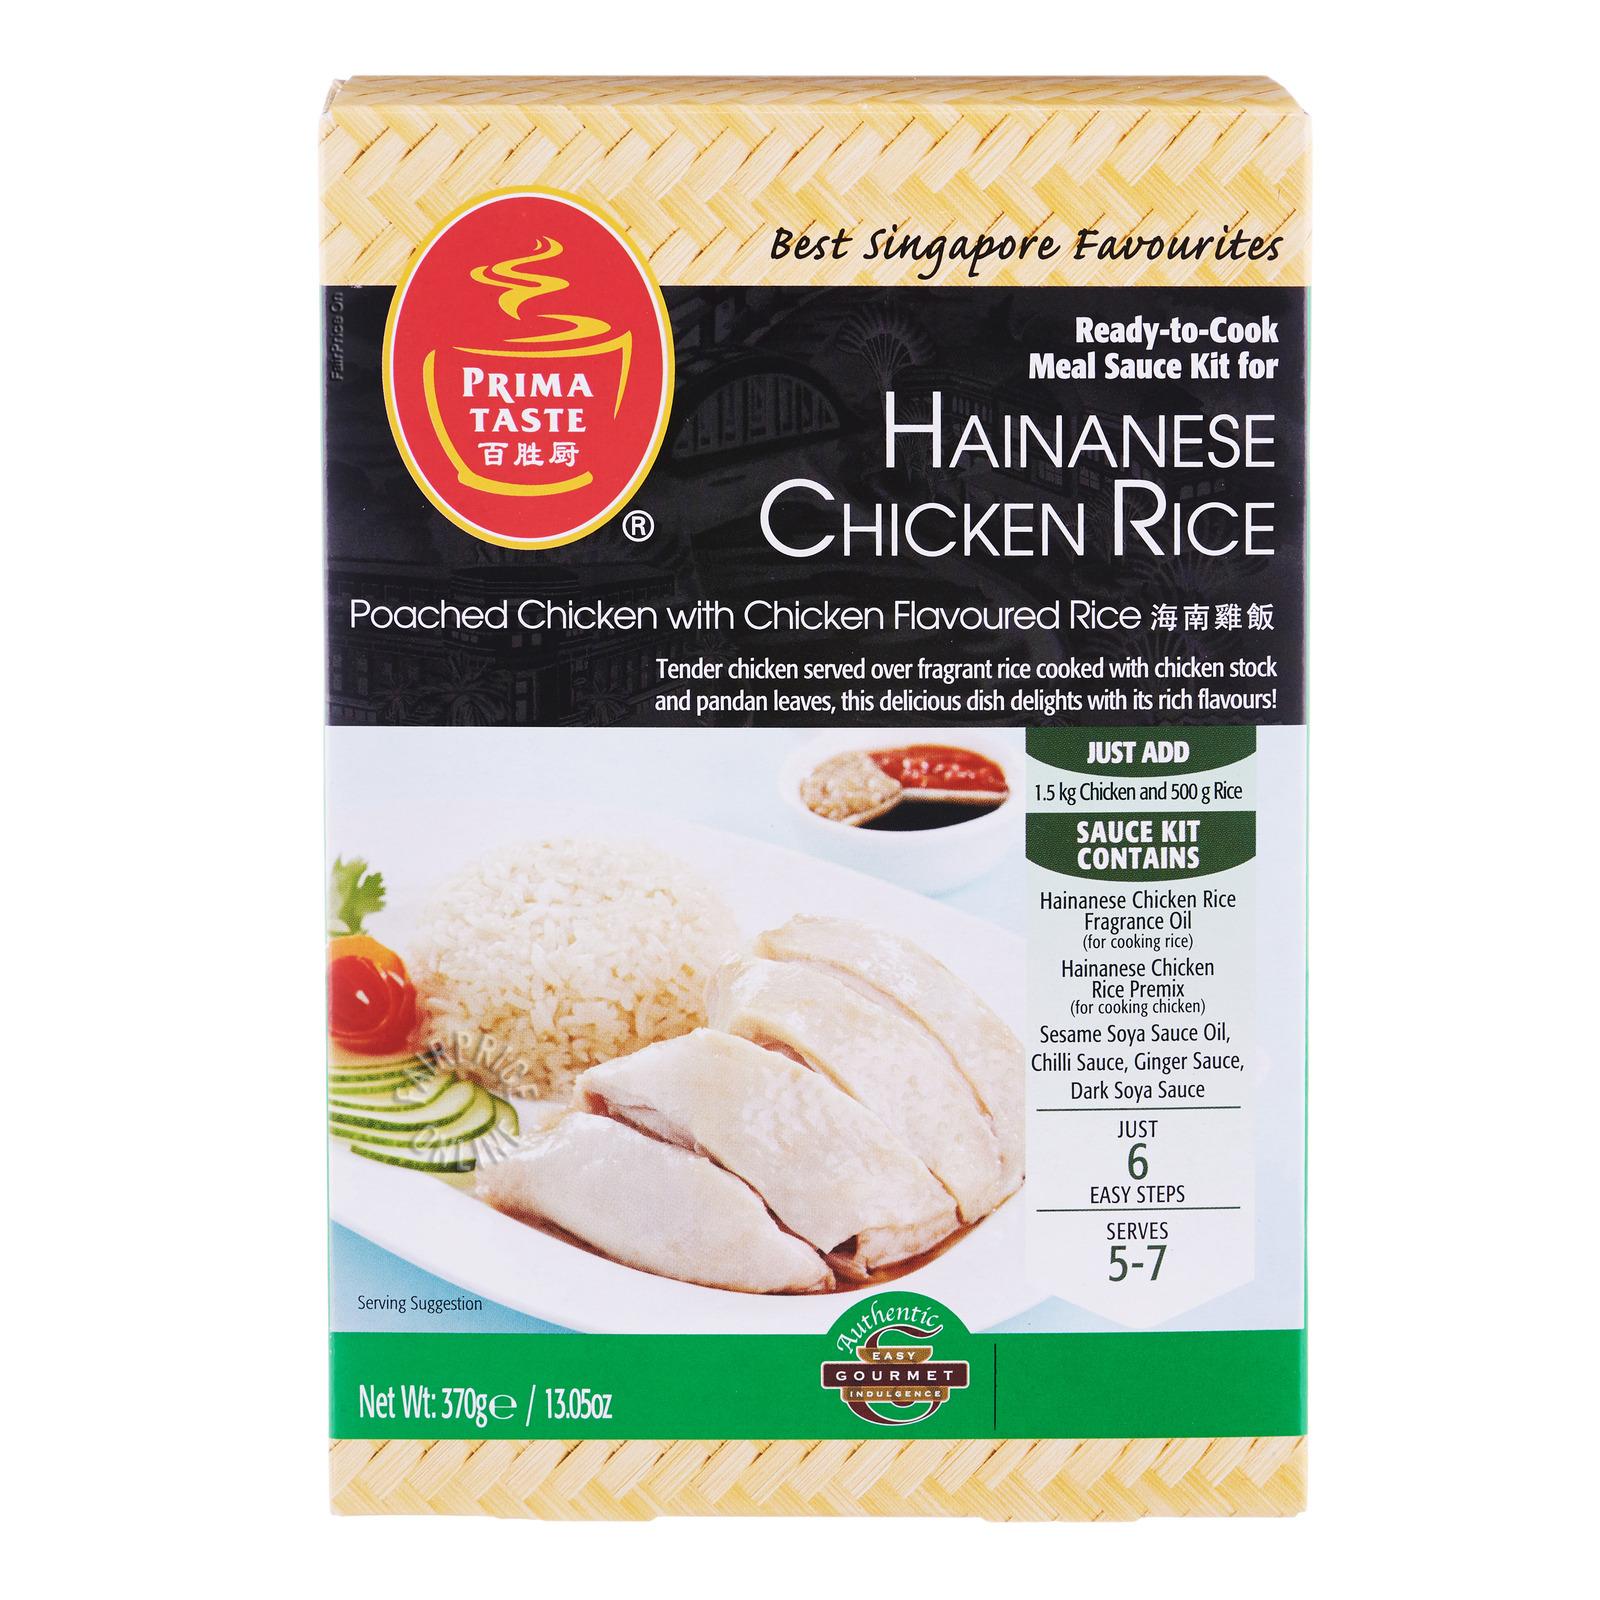 Prima Taste Sauce Kit - Hainanese Chicken Rice